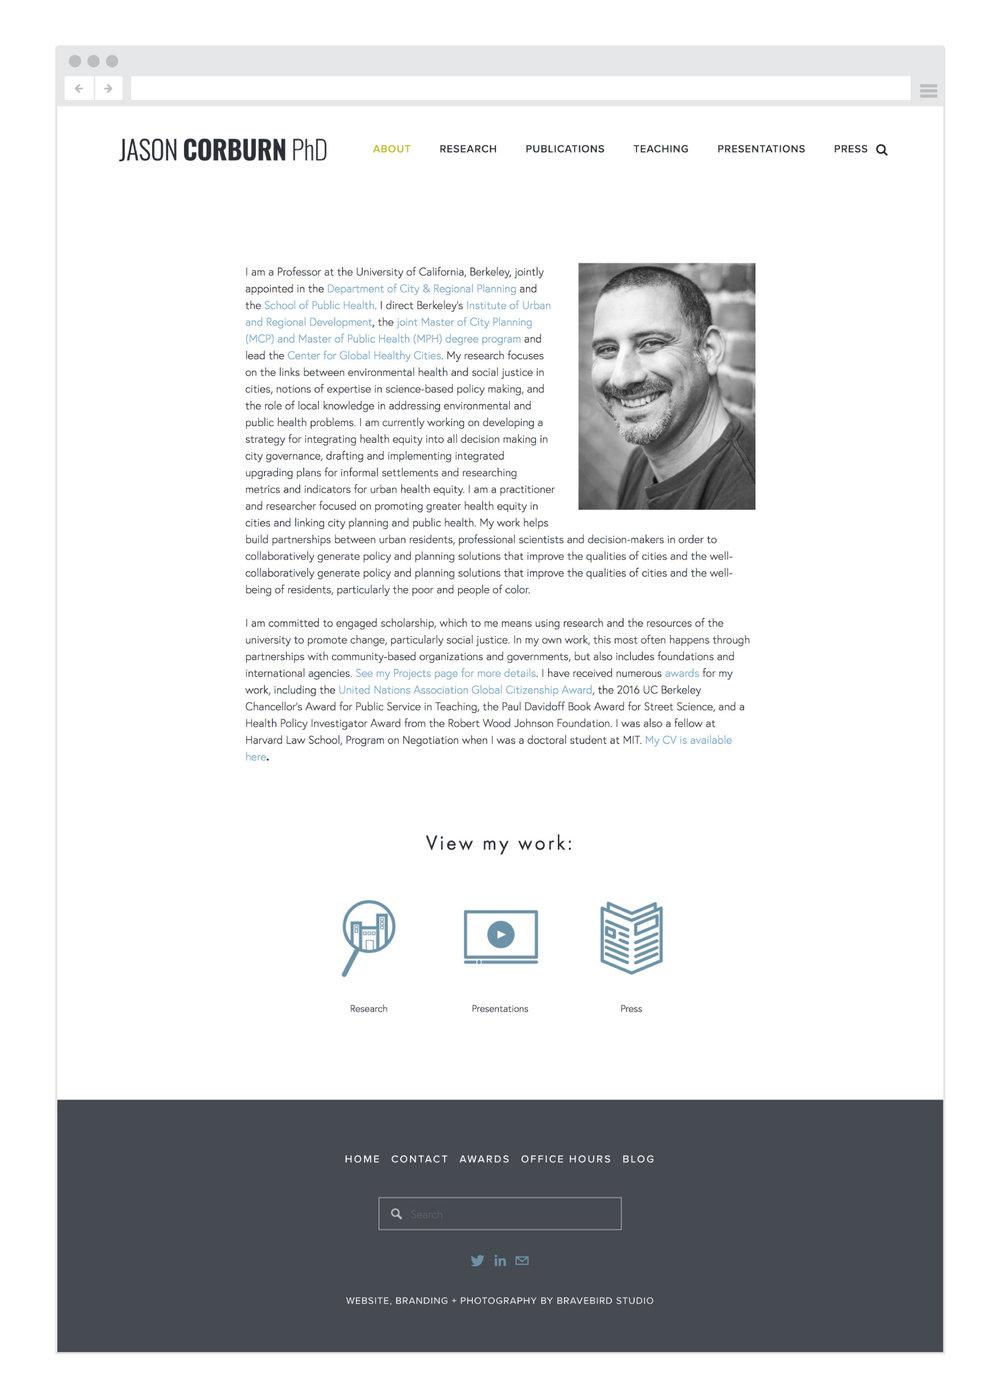 Jason-Corburn-aboutpage-Bravebird-Studio-branding-web-design